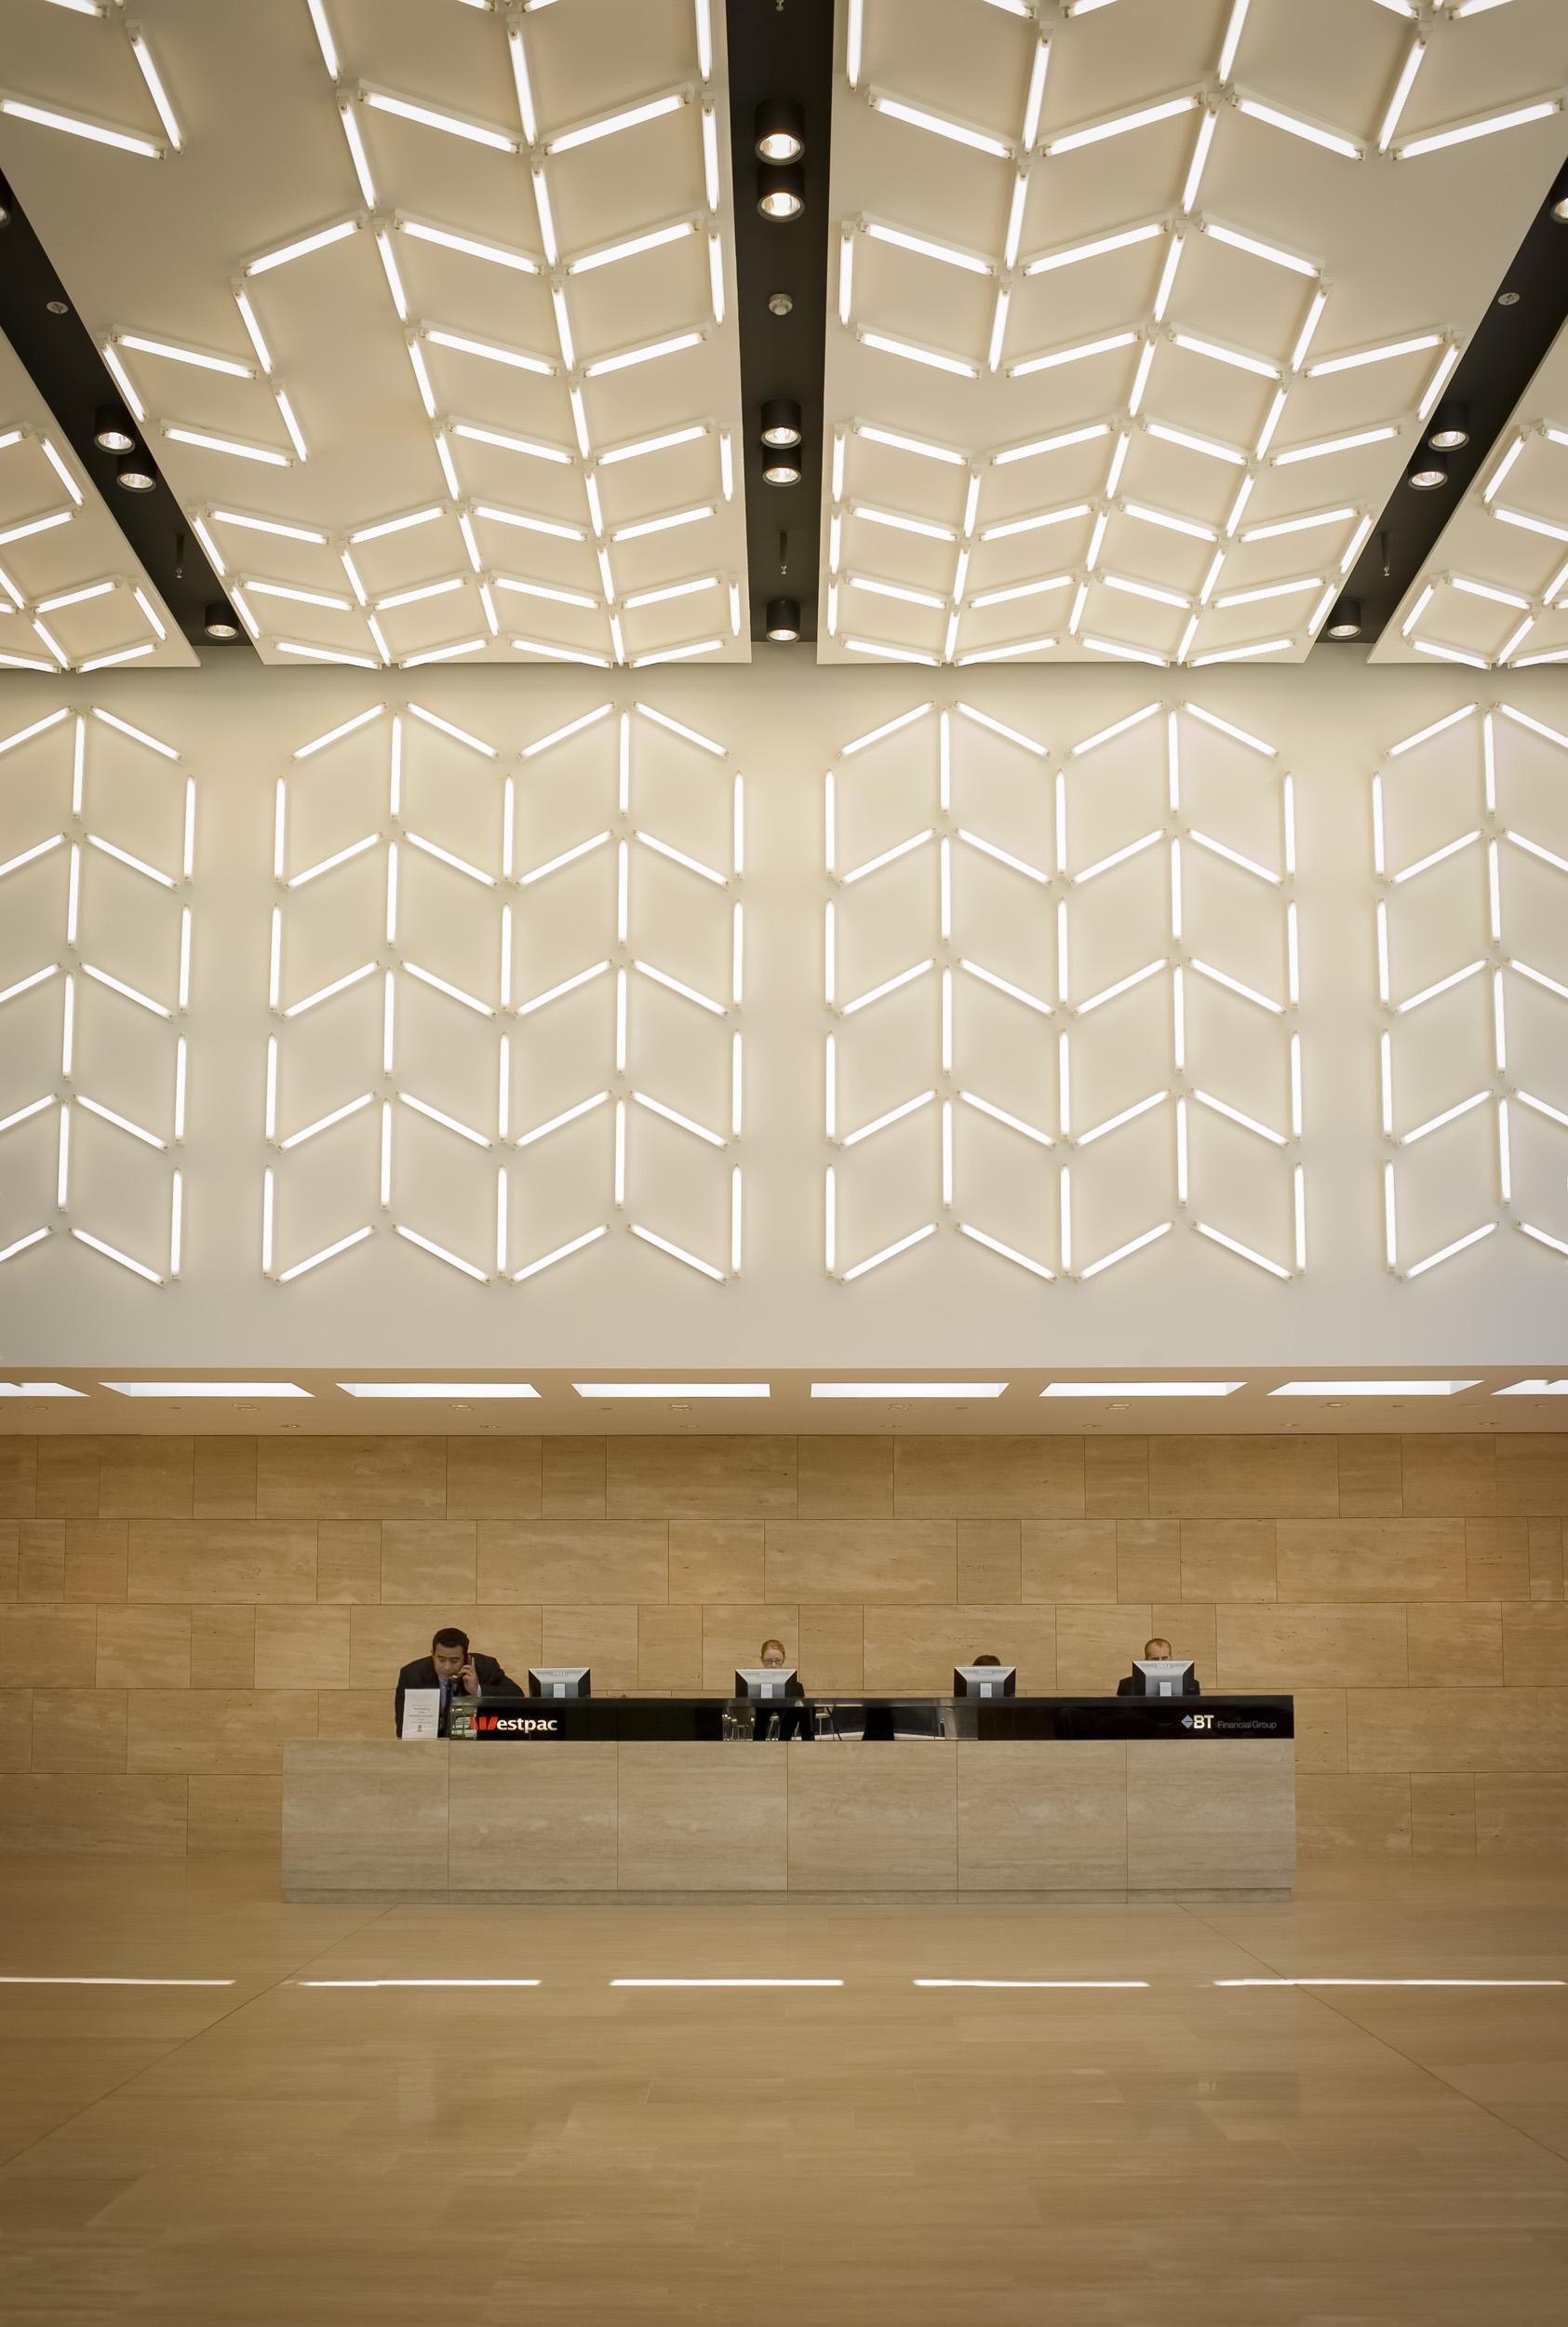 hirise_architecture_sydney_australia_03.jpg